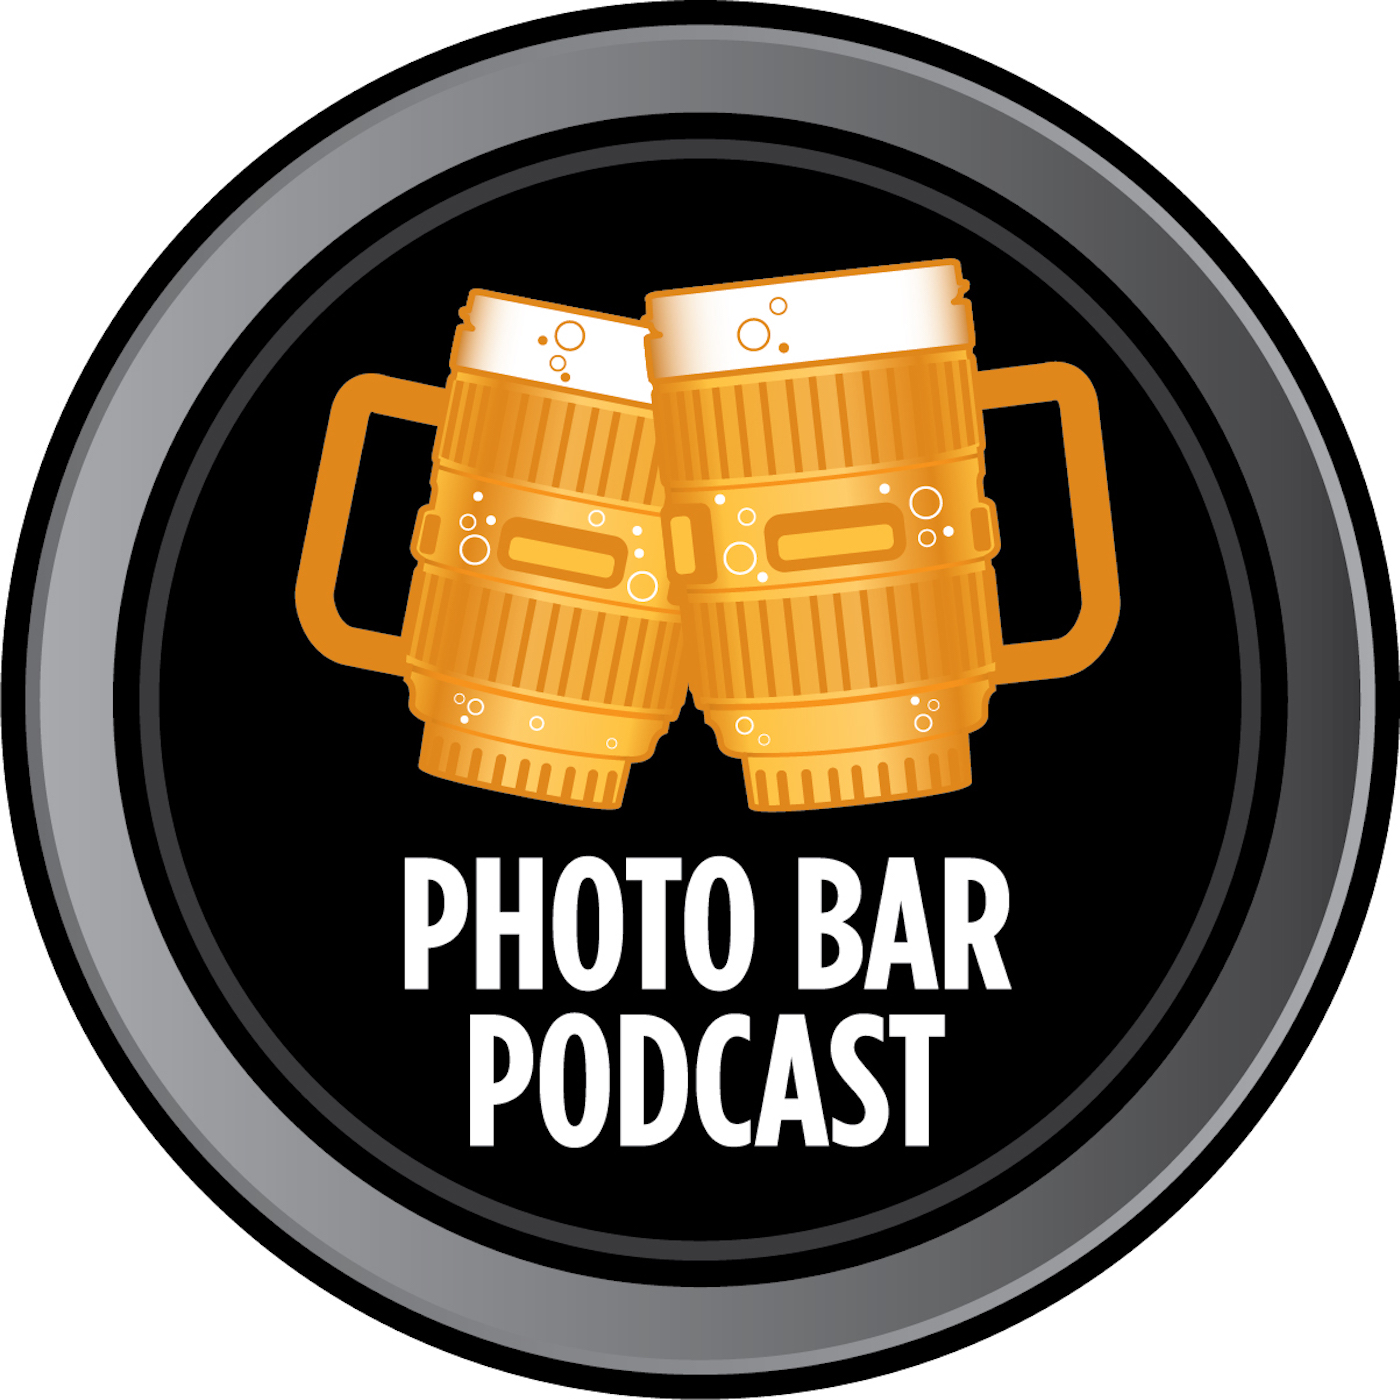 The Photo Bar Podcast